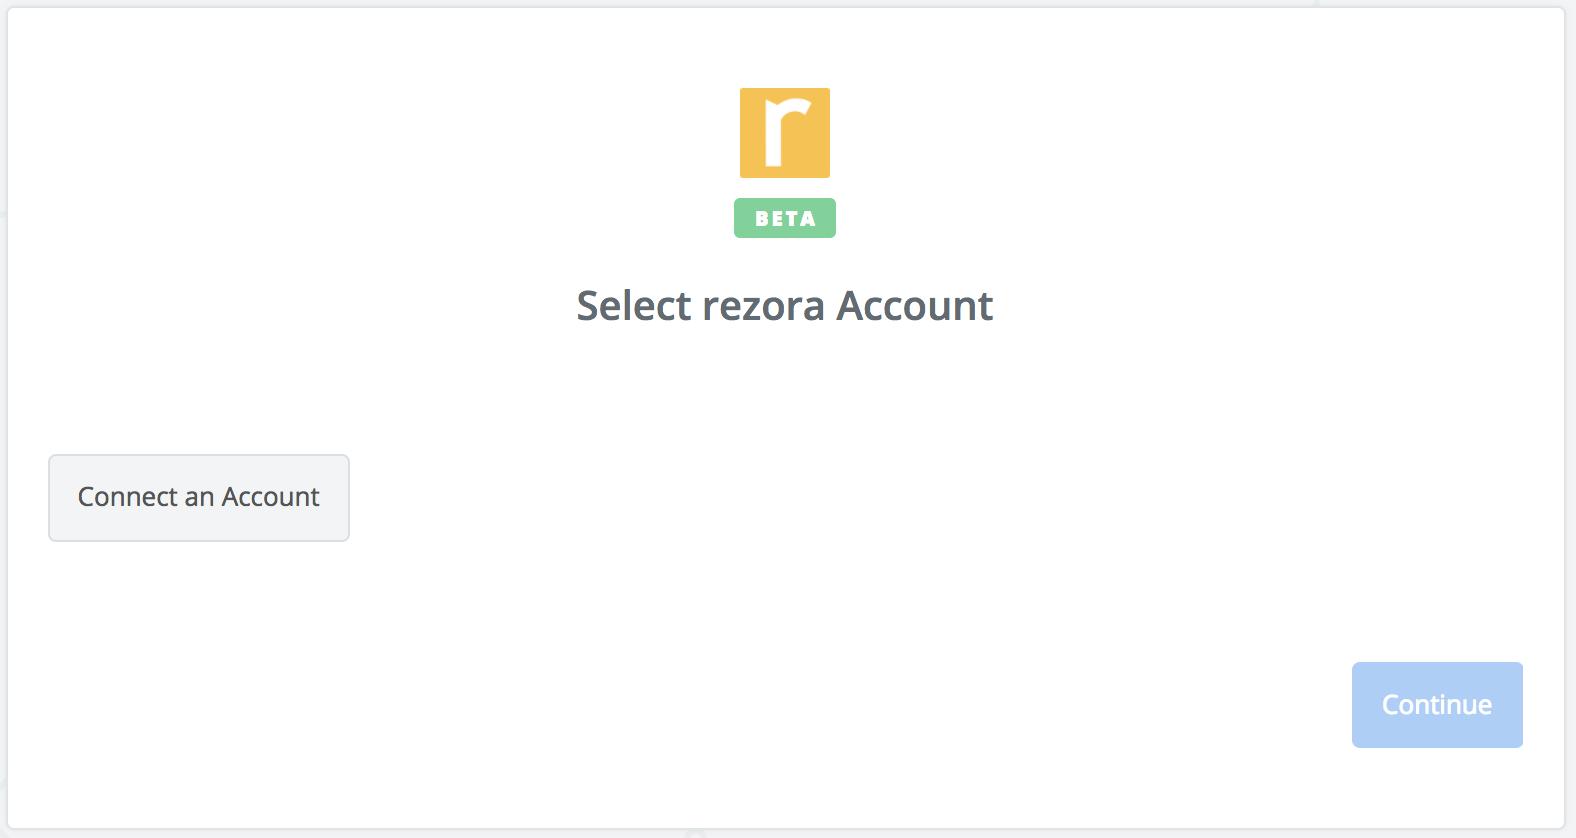 Click to connect rezora